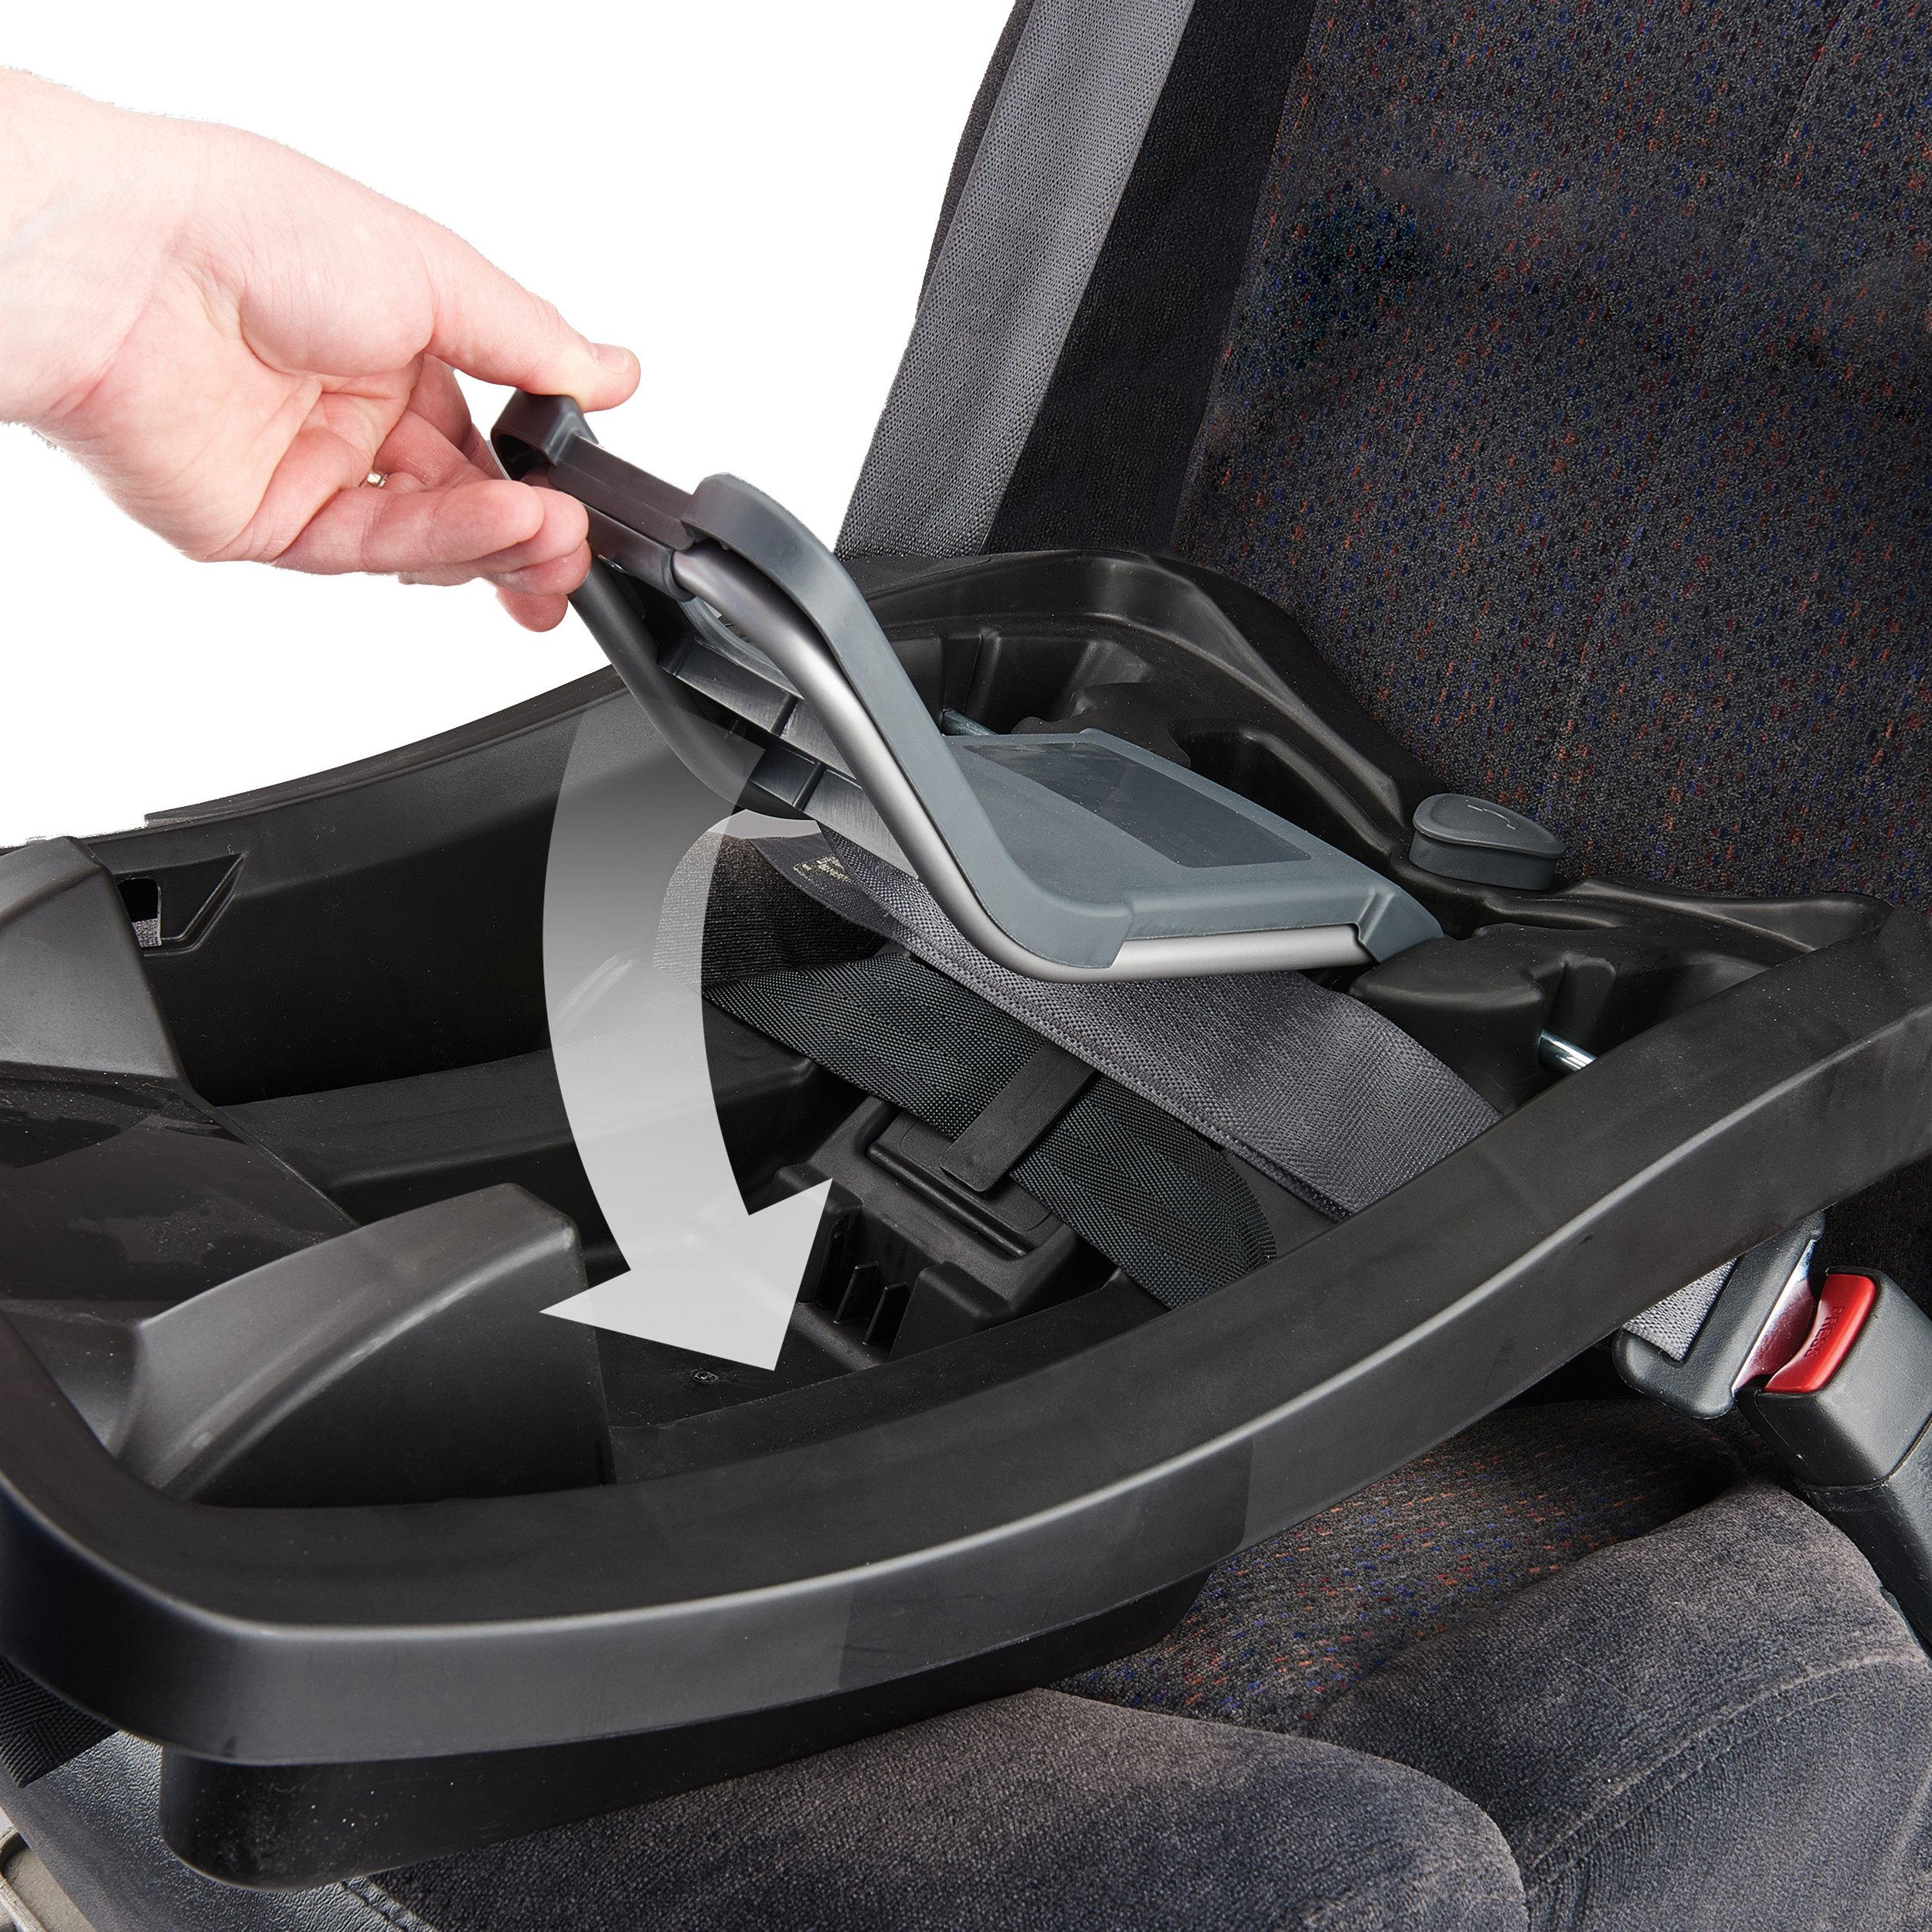 Evenflo Advanced SensorSafe Epic Travel System with LiteMax Infant Car Seat, Jet by Evenflo (Image #4)